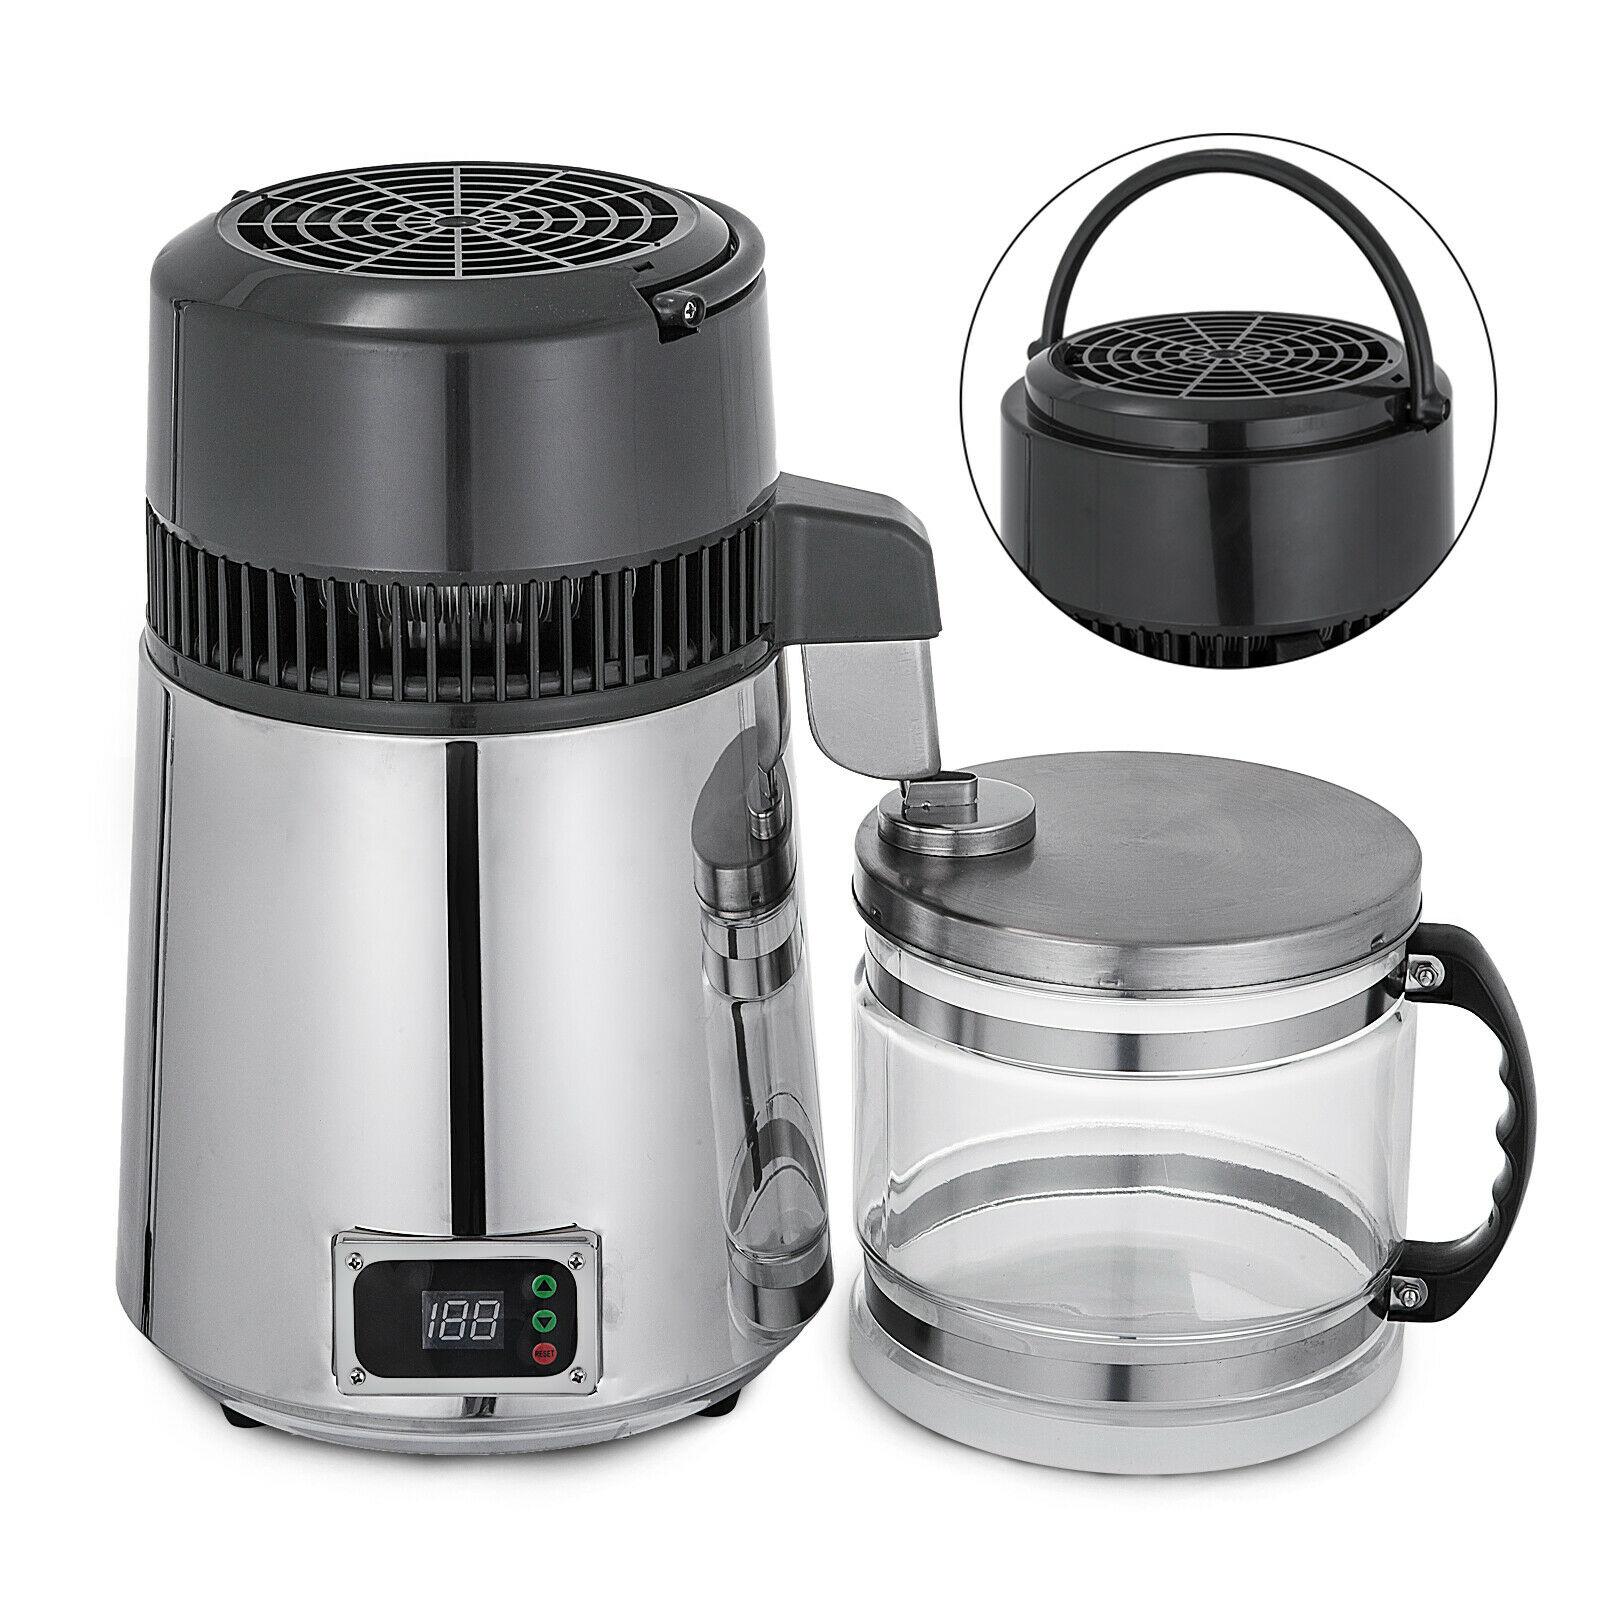 4L المنزلية المياه النقية المقطر درجة الحرارة التي تسيطر عليها الكحول التقطير معدات تنقية الفولاذ المقاوم للصدأ الزجاج جرة